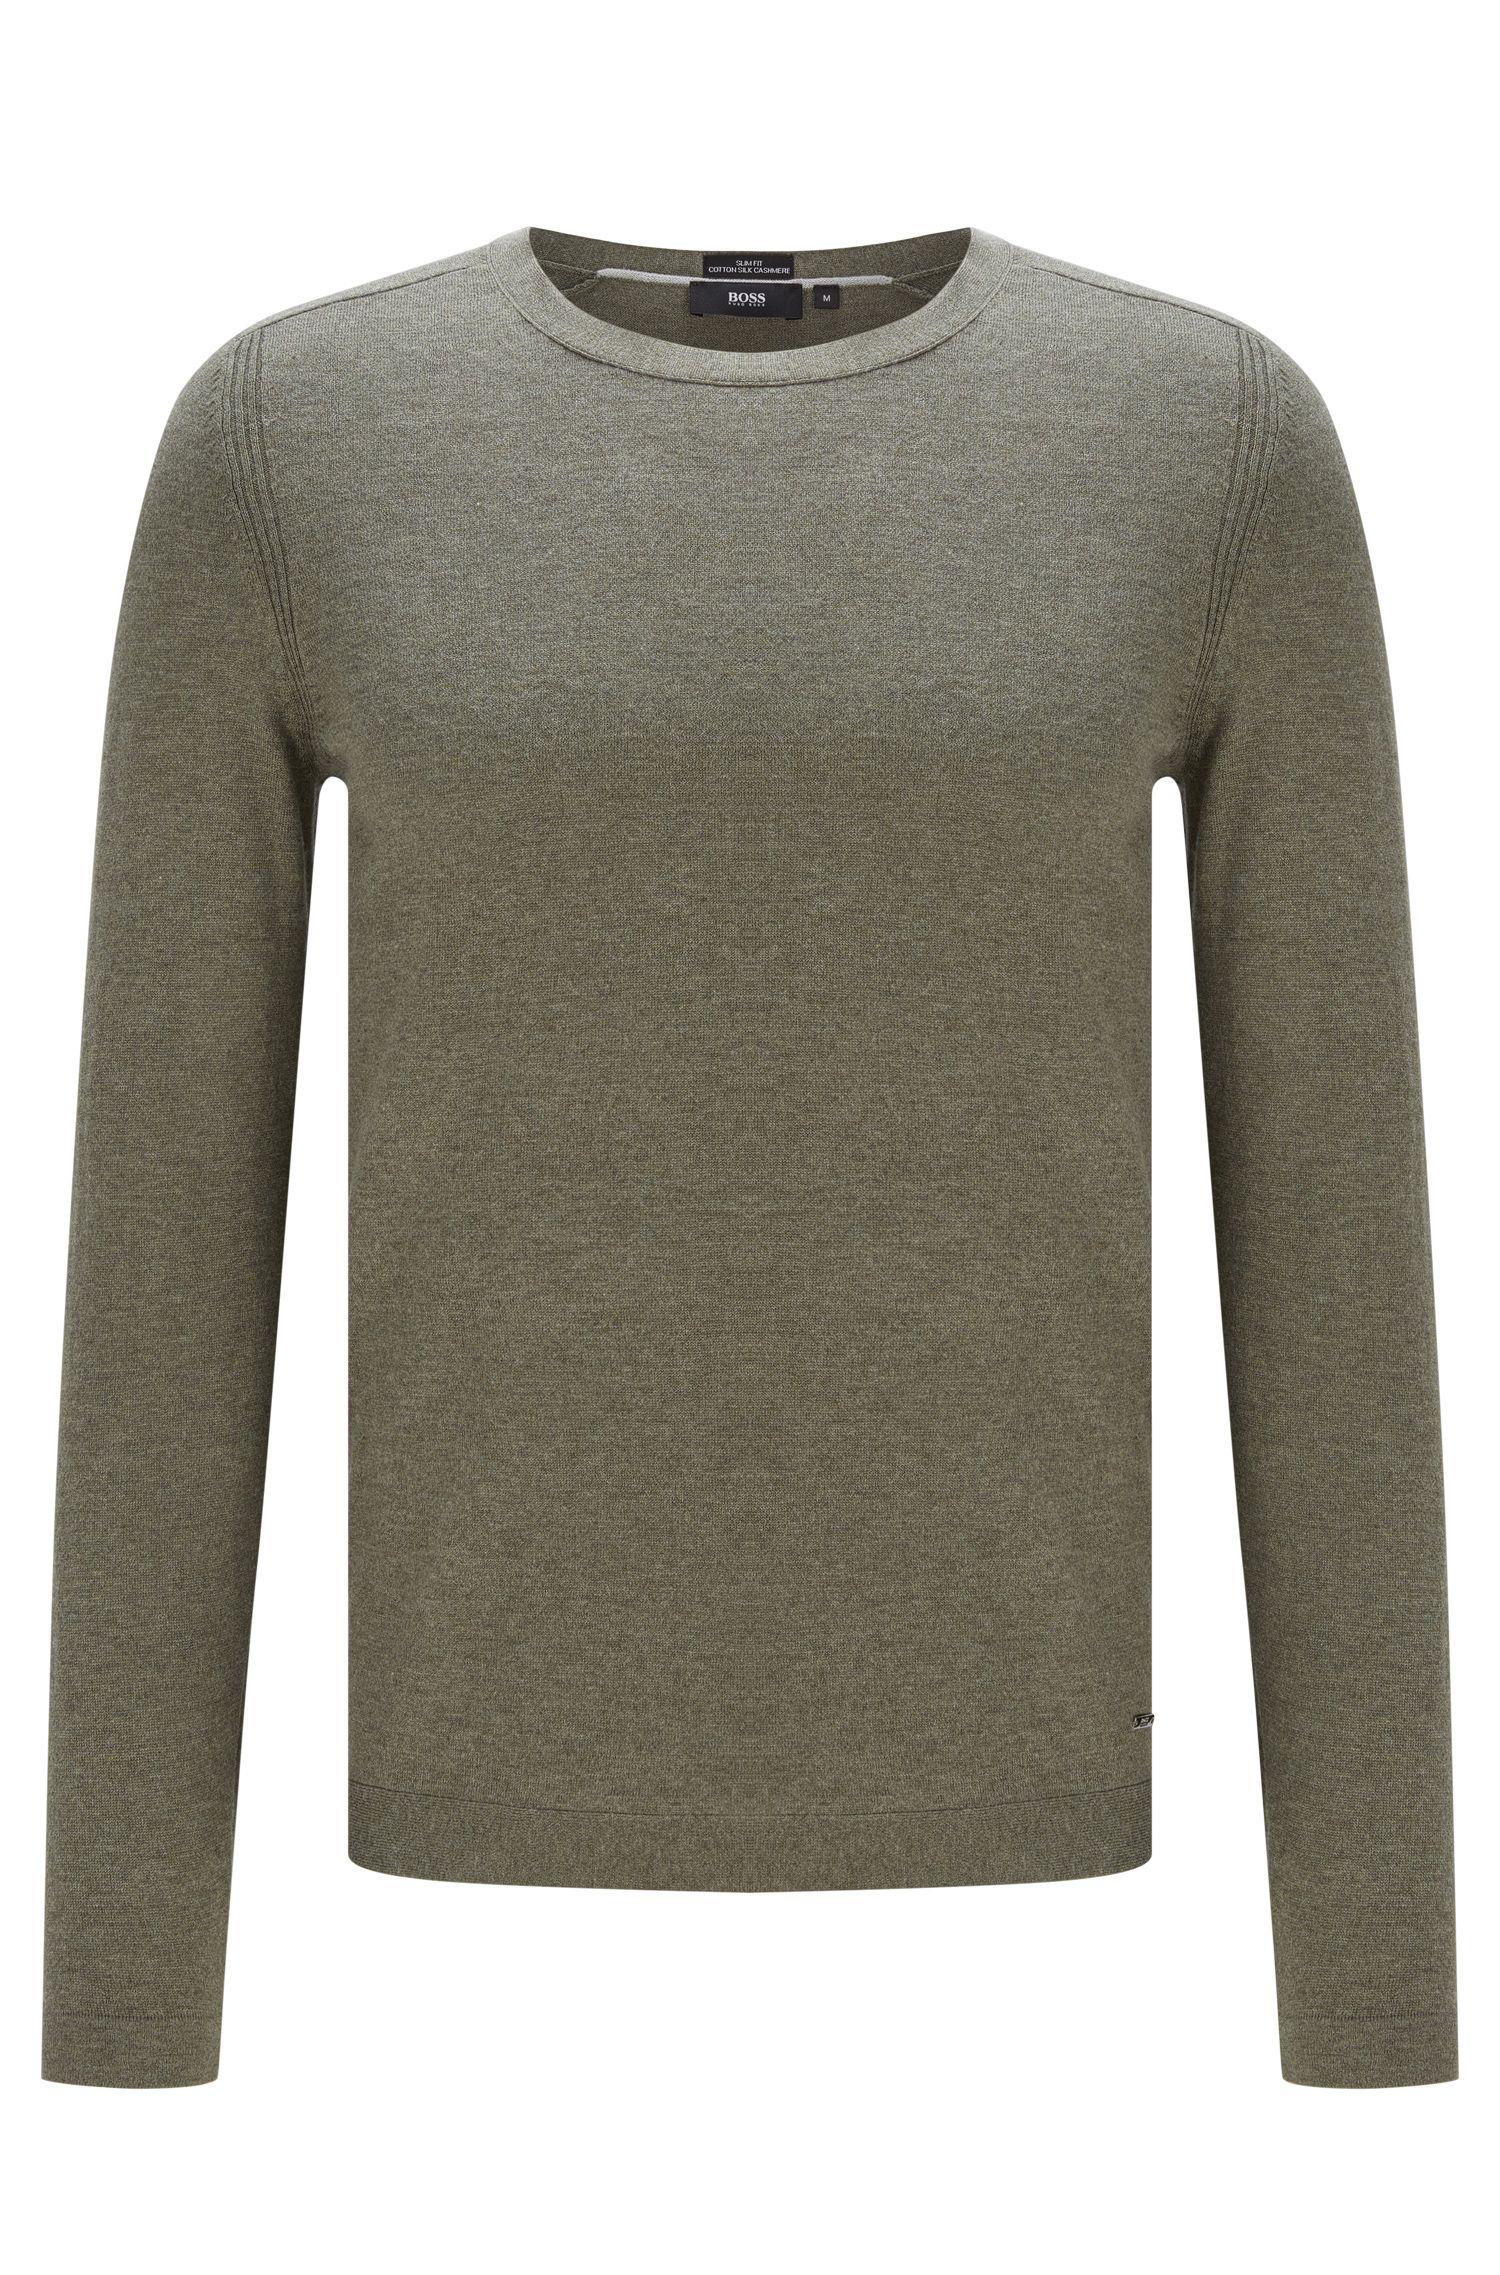 'Onario' | Cotton Silk Cashmere Sweater